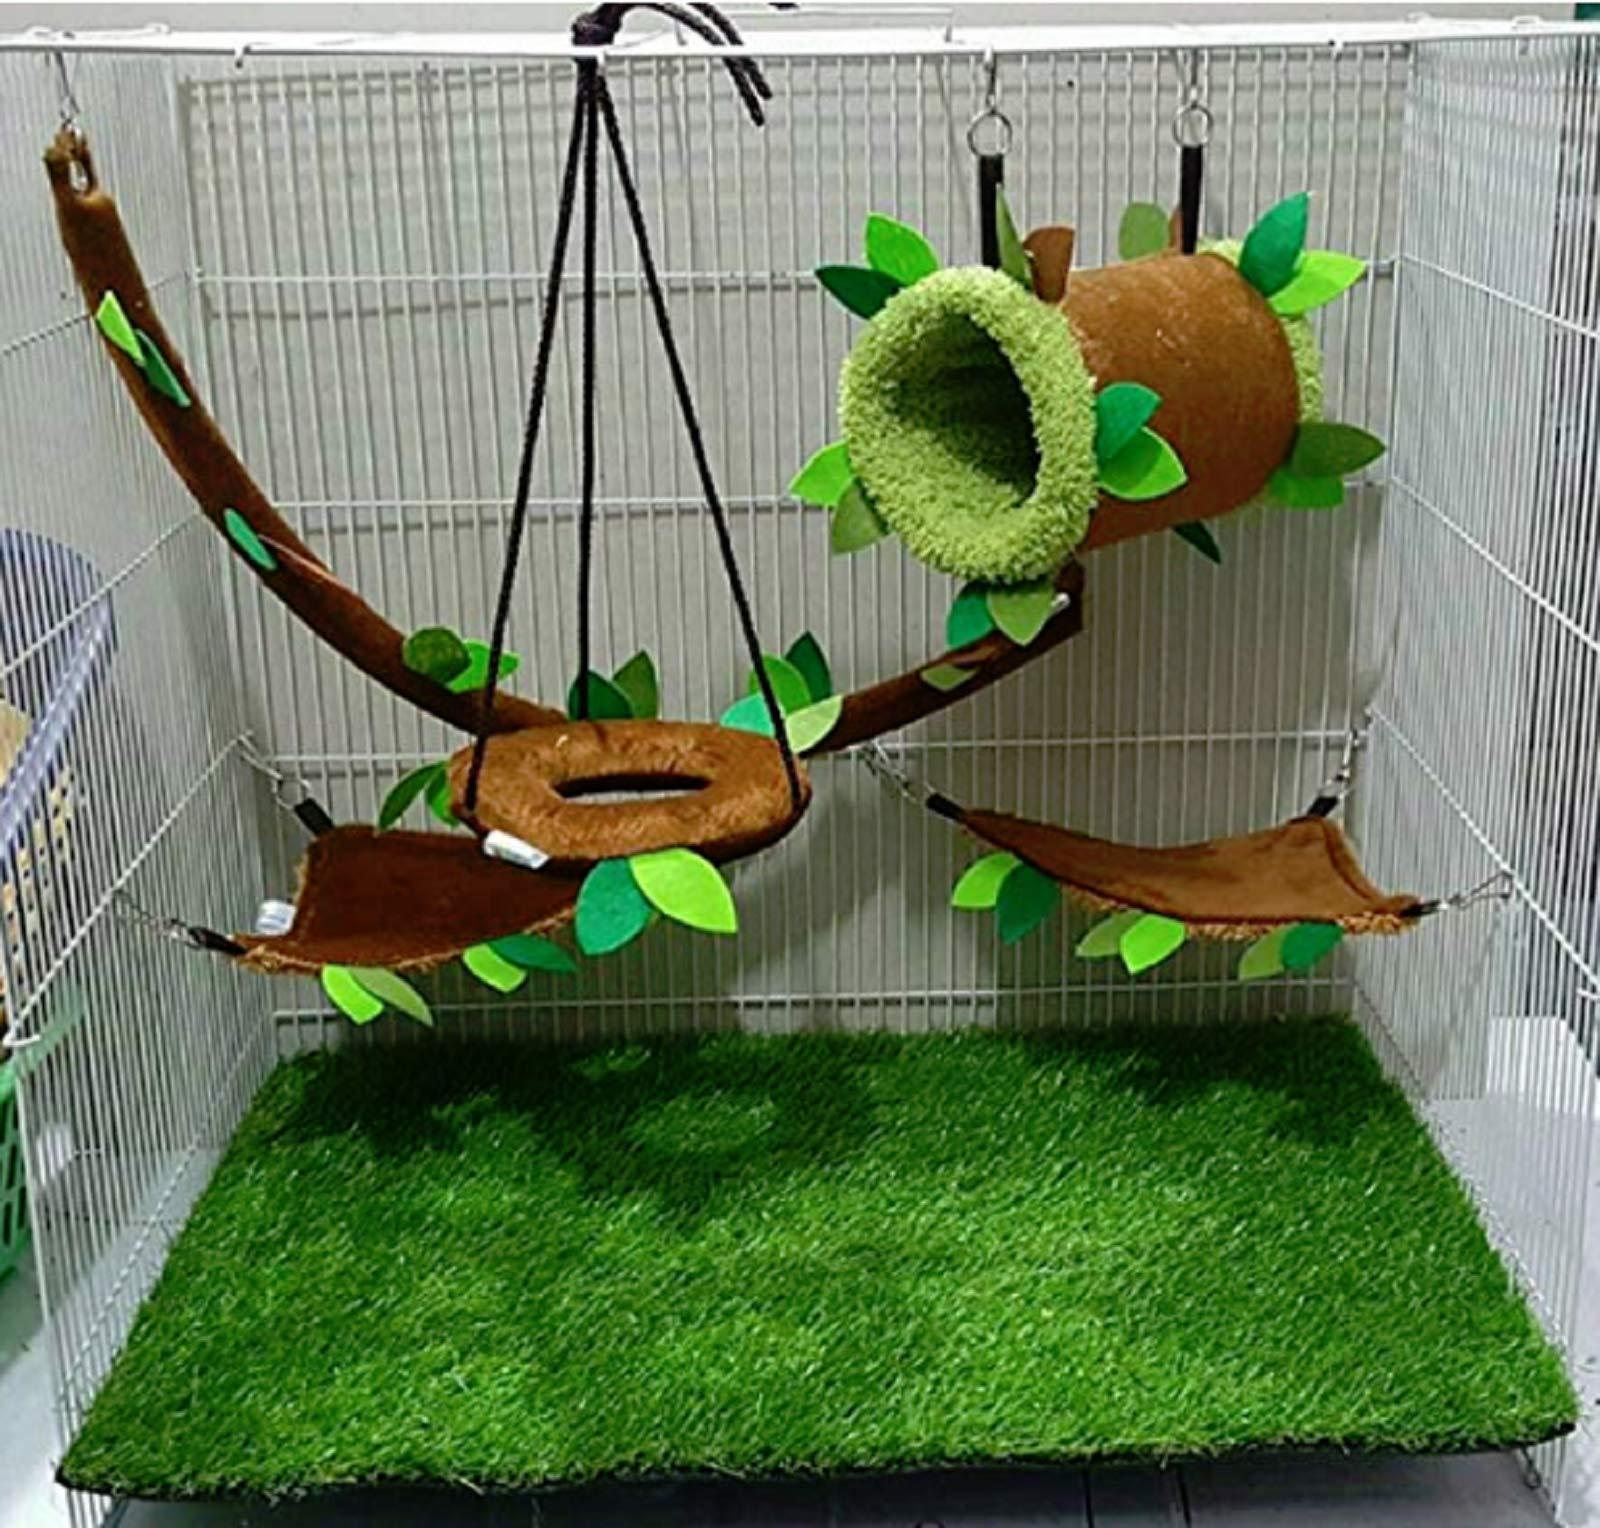 Hot Sale! 5 piece KPS Cute Sugar Glider Hamster Squirrel Small Pet Cage Set Forest Pattern Light Brown, Polar Bear's Republic by Polar Bear's Pet Shop